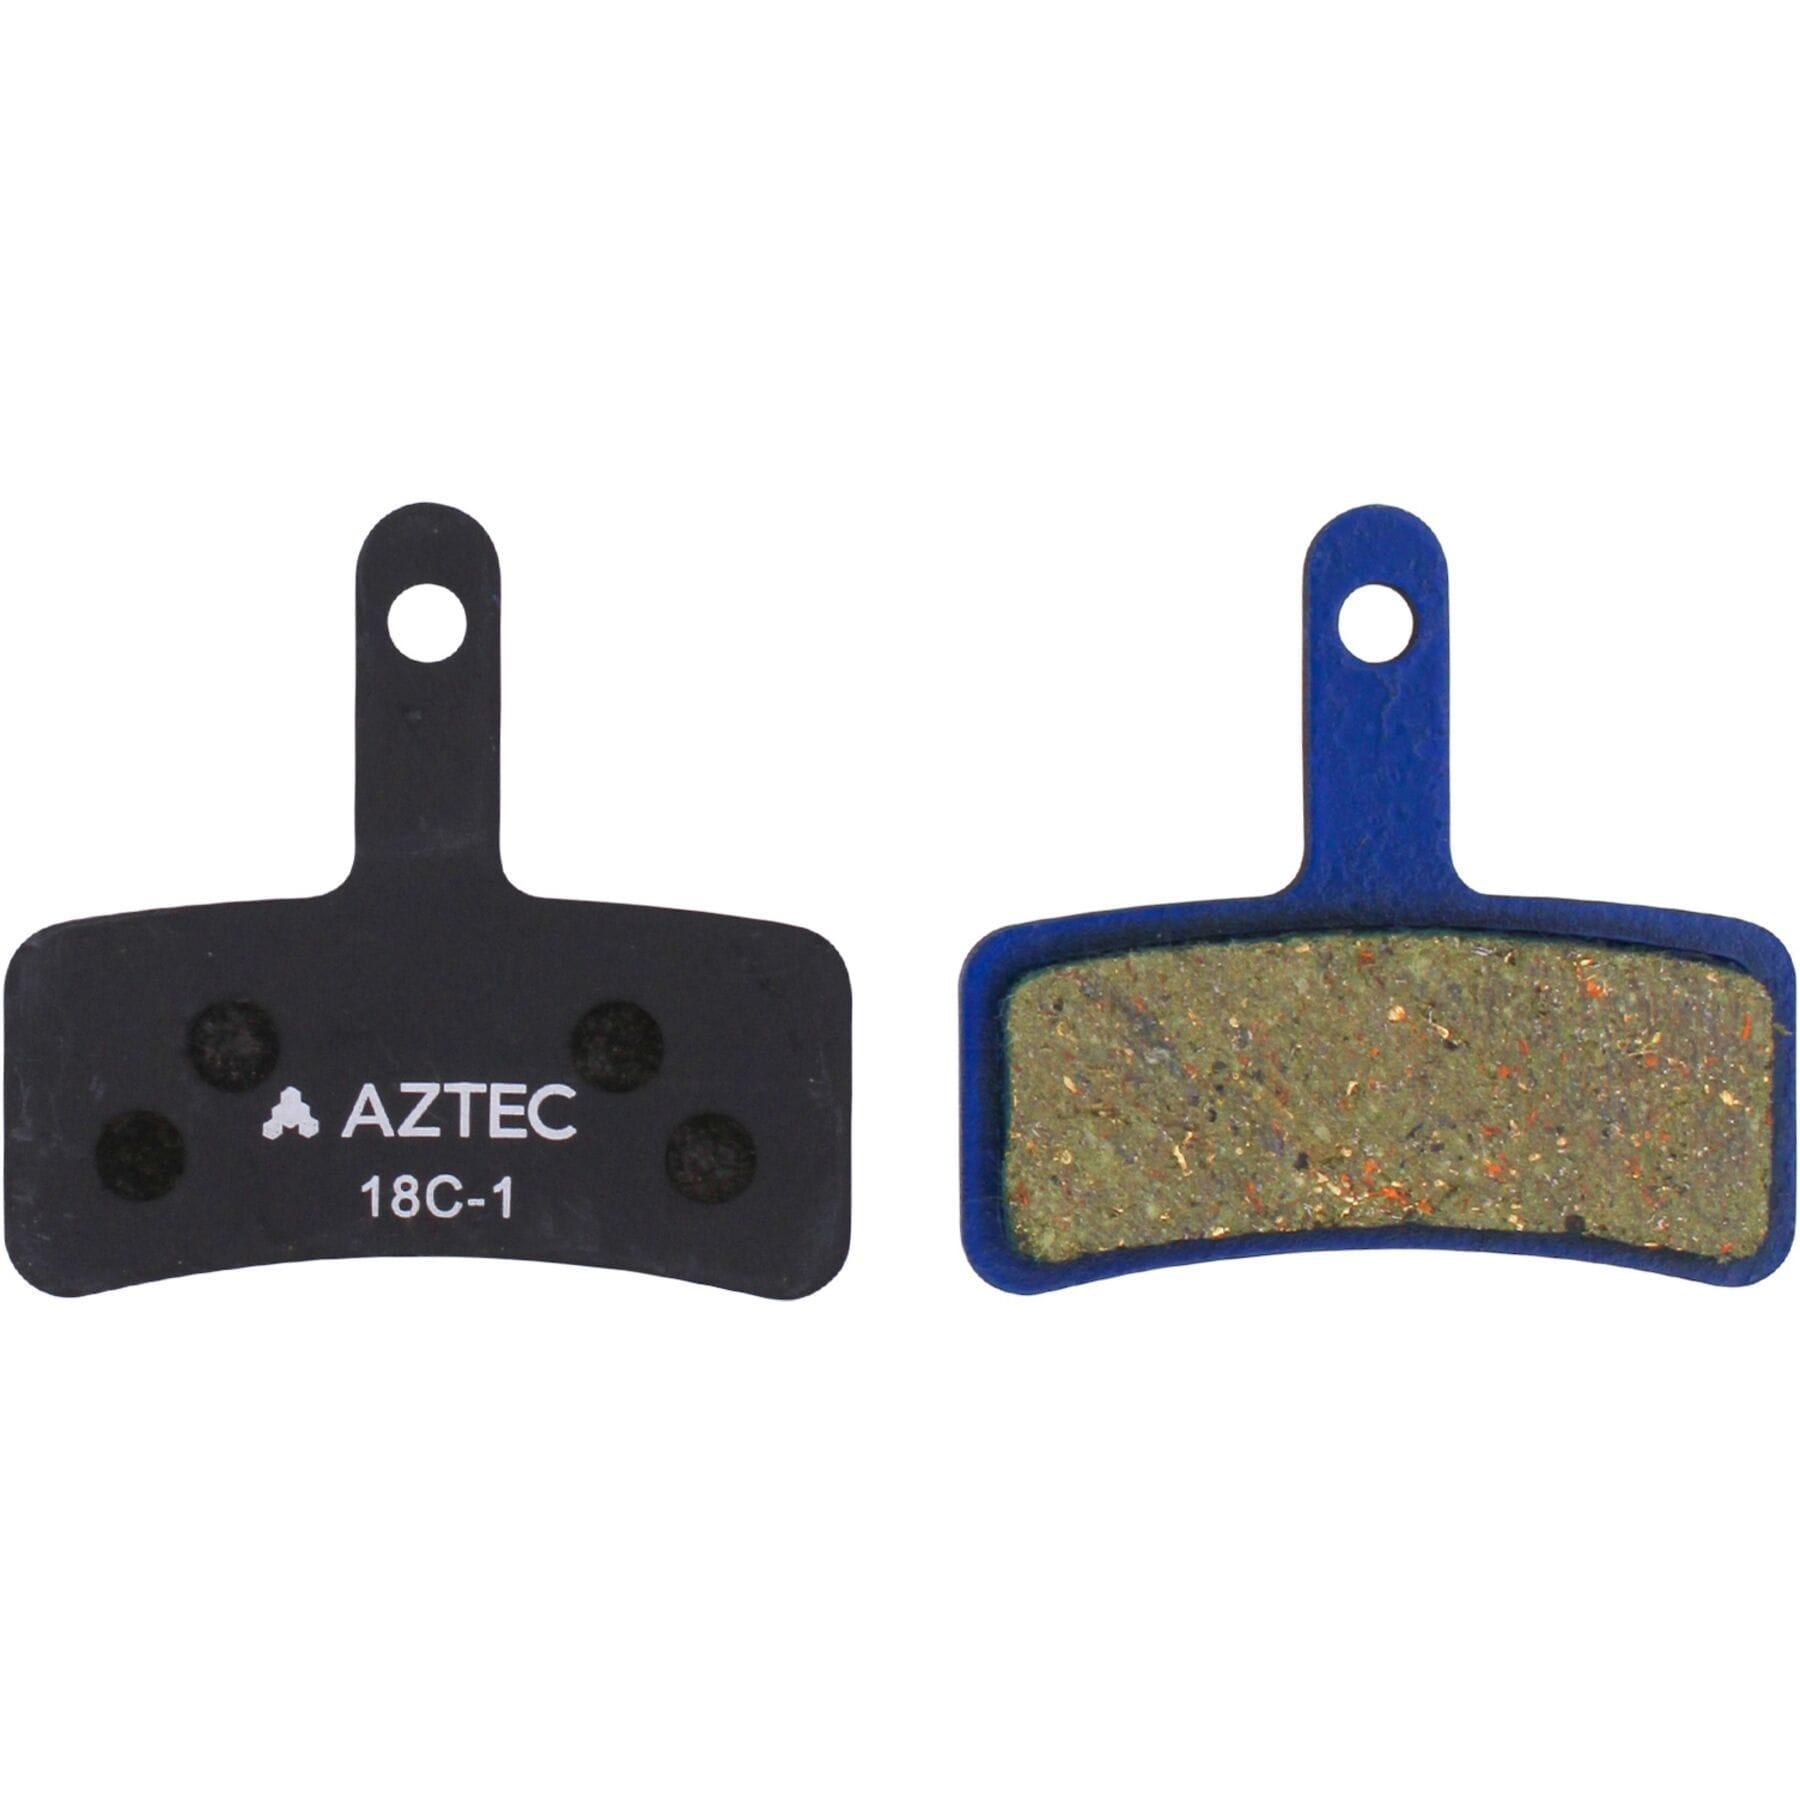 Aztec Organic disc brake pads for Tektro Dorado callipers